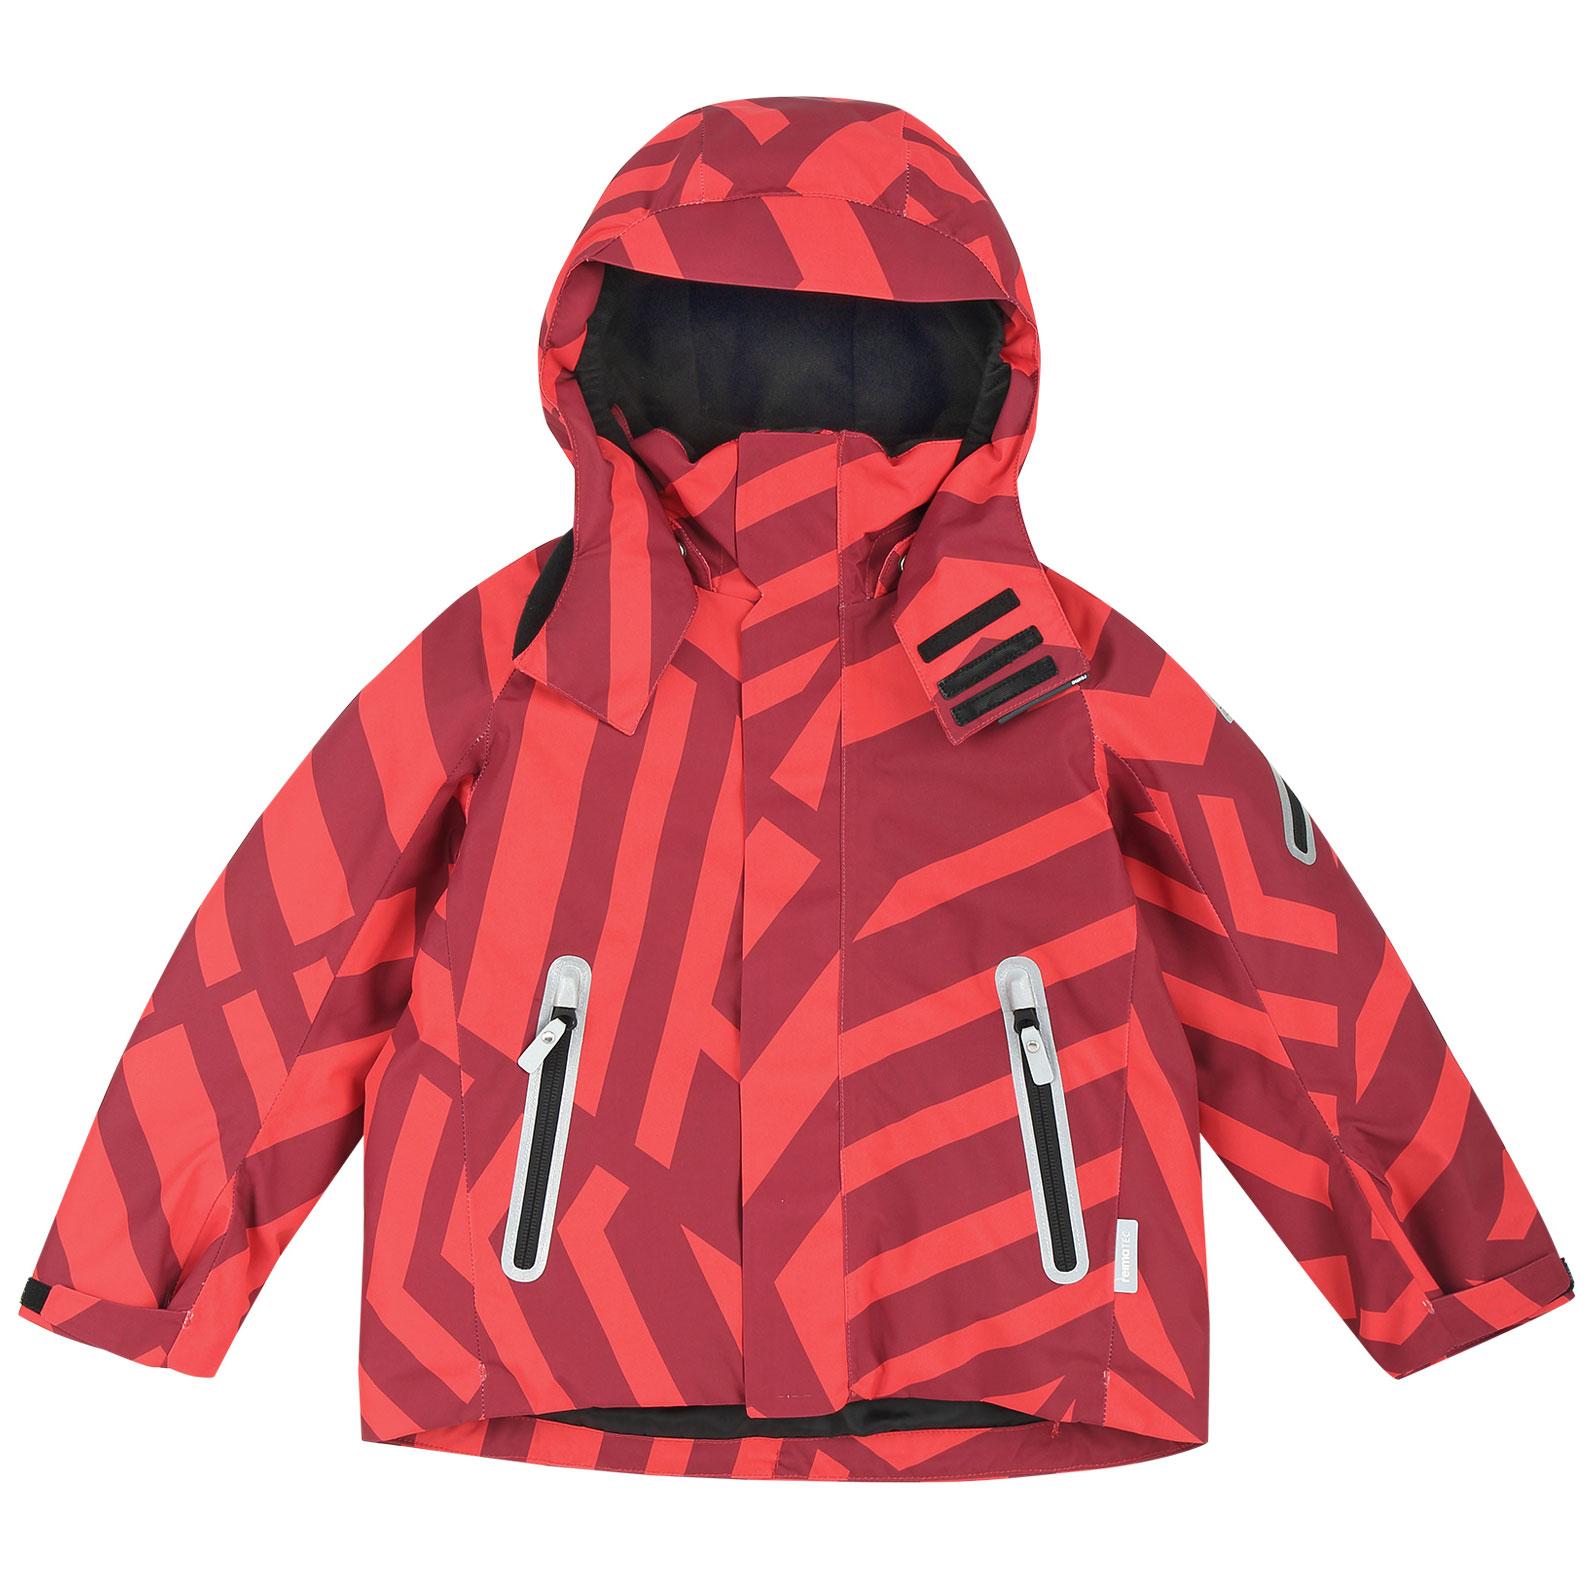 Produktbild von Reima Kinder Reimatec Winter Jacke Regor - lingonberry red